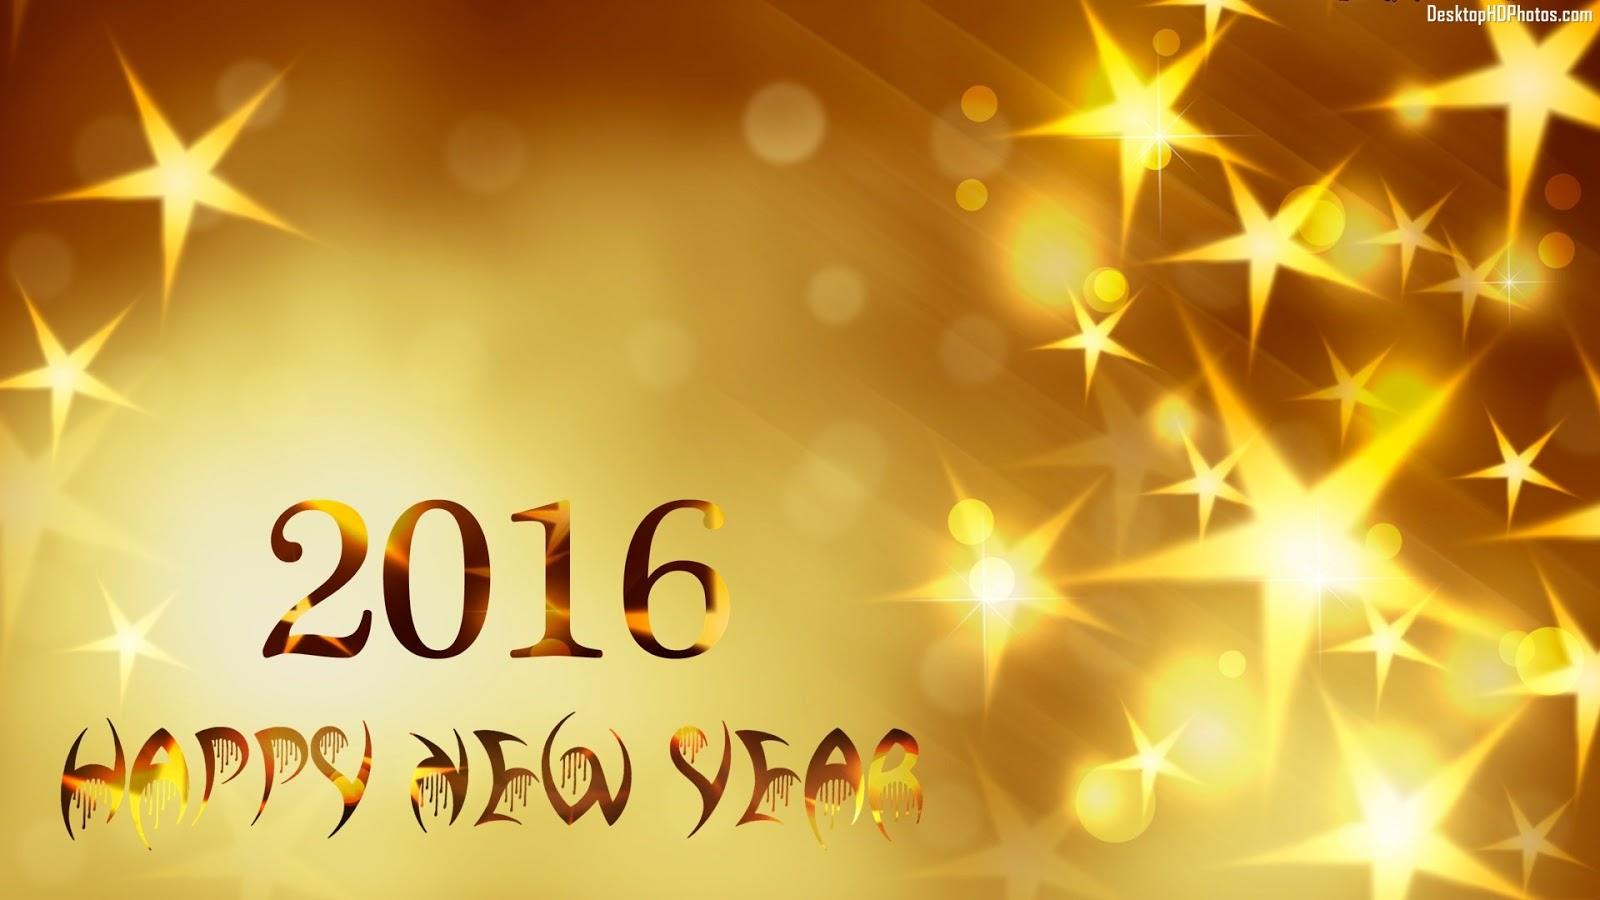 hinh-anh-tet-2016-xuan-2016-happy-new-year-2016-5